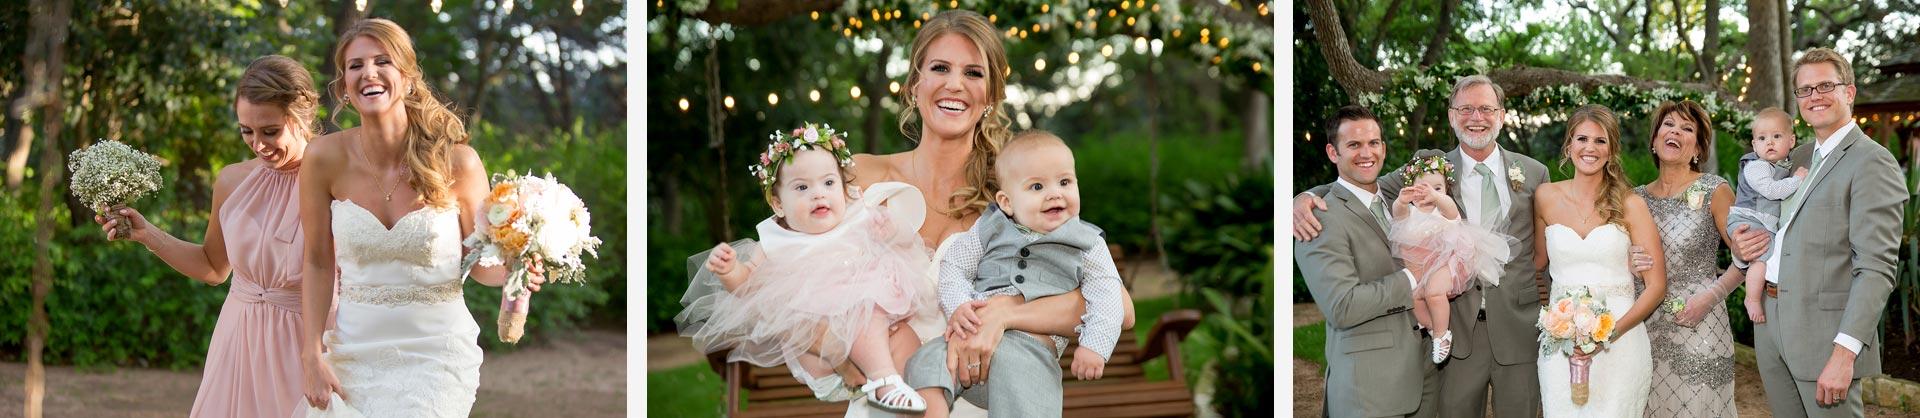 Wedding Photographers in Texas